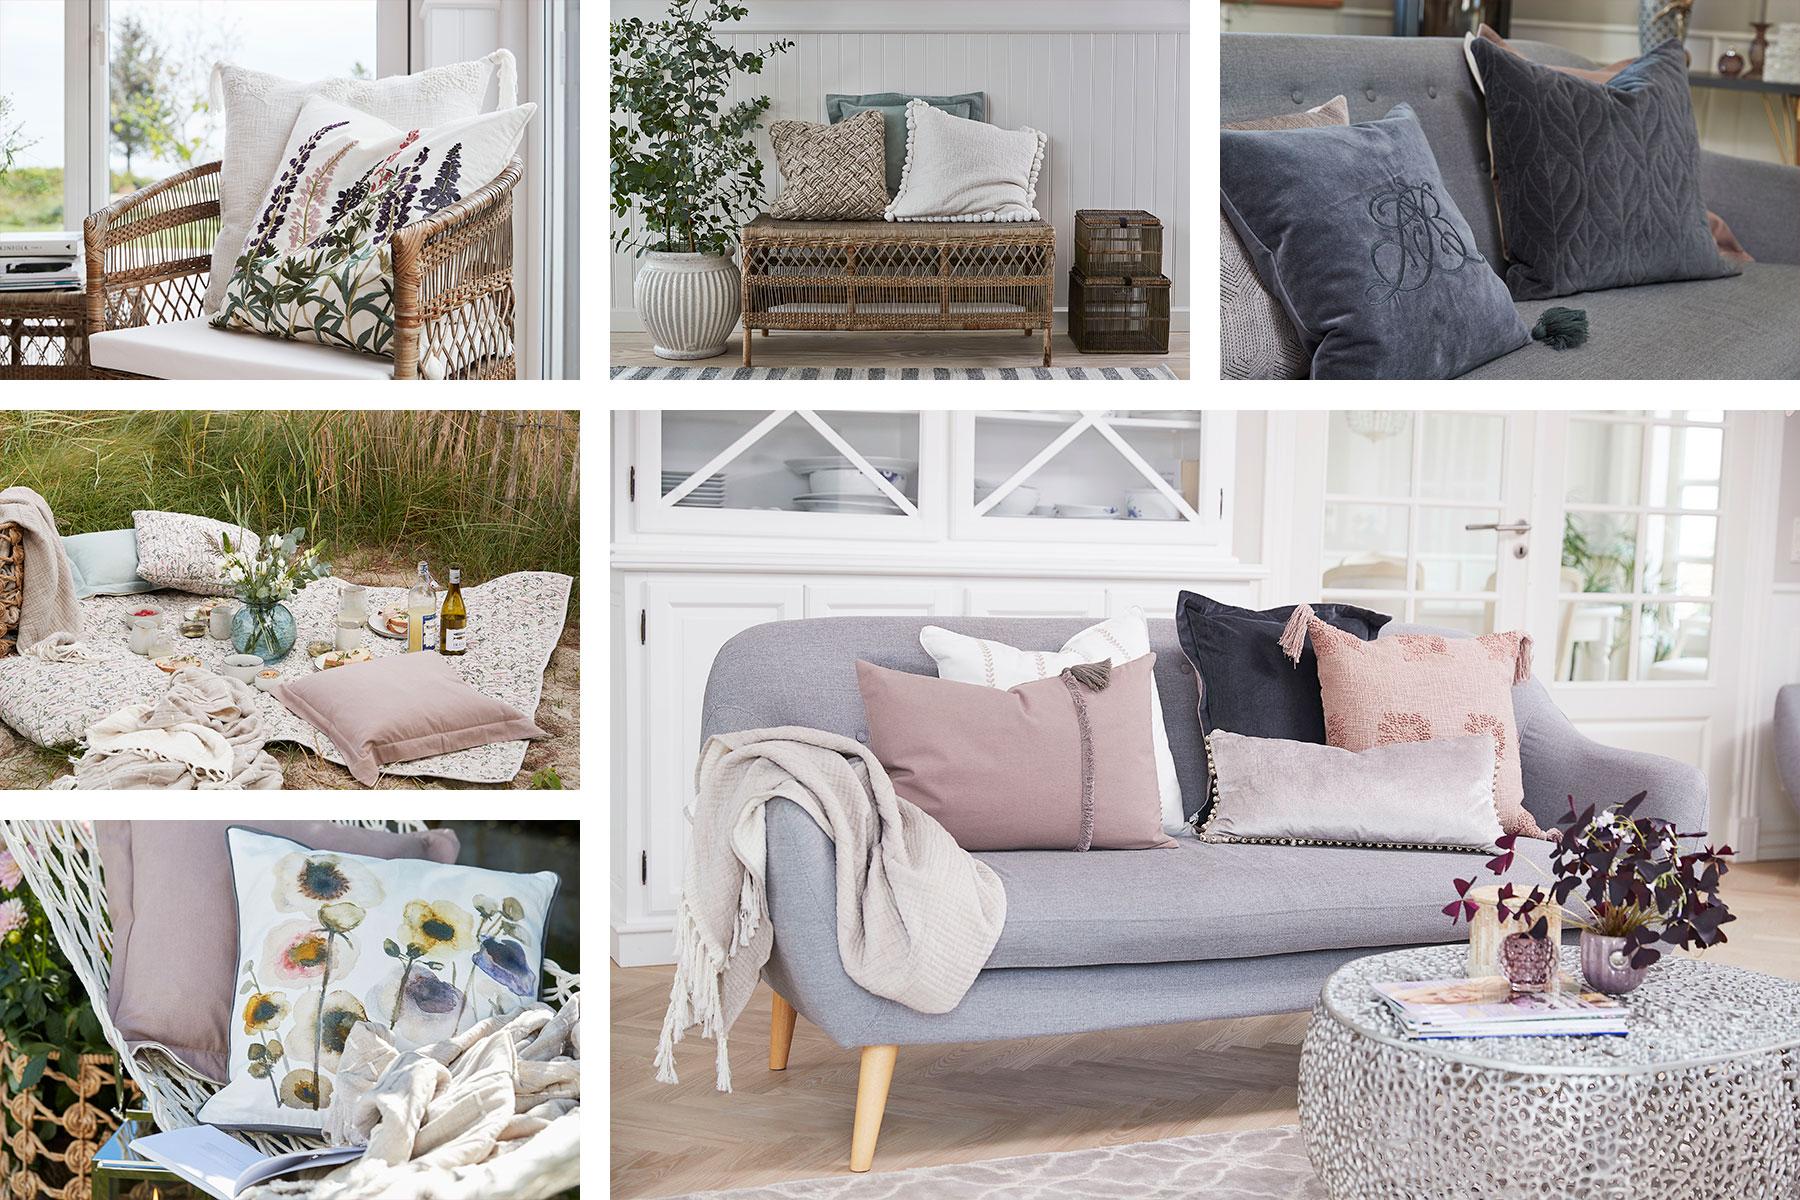 Scandinavian designed wholesale cushions from Lene Bjerre